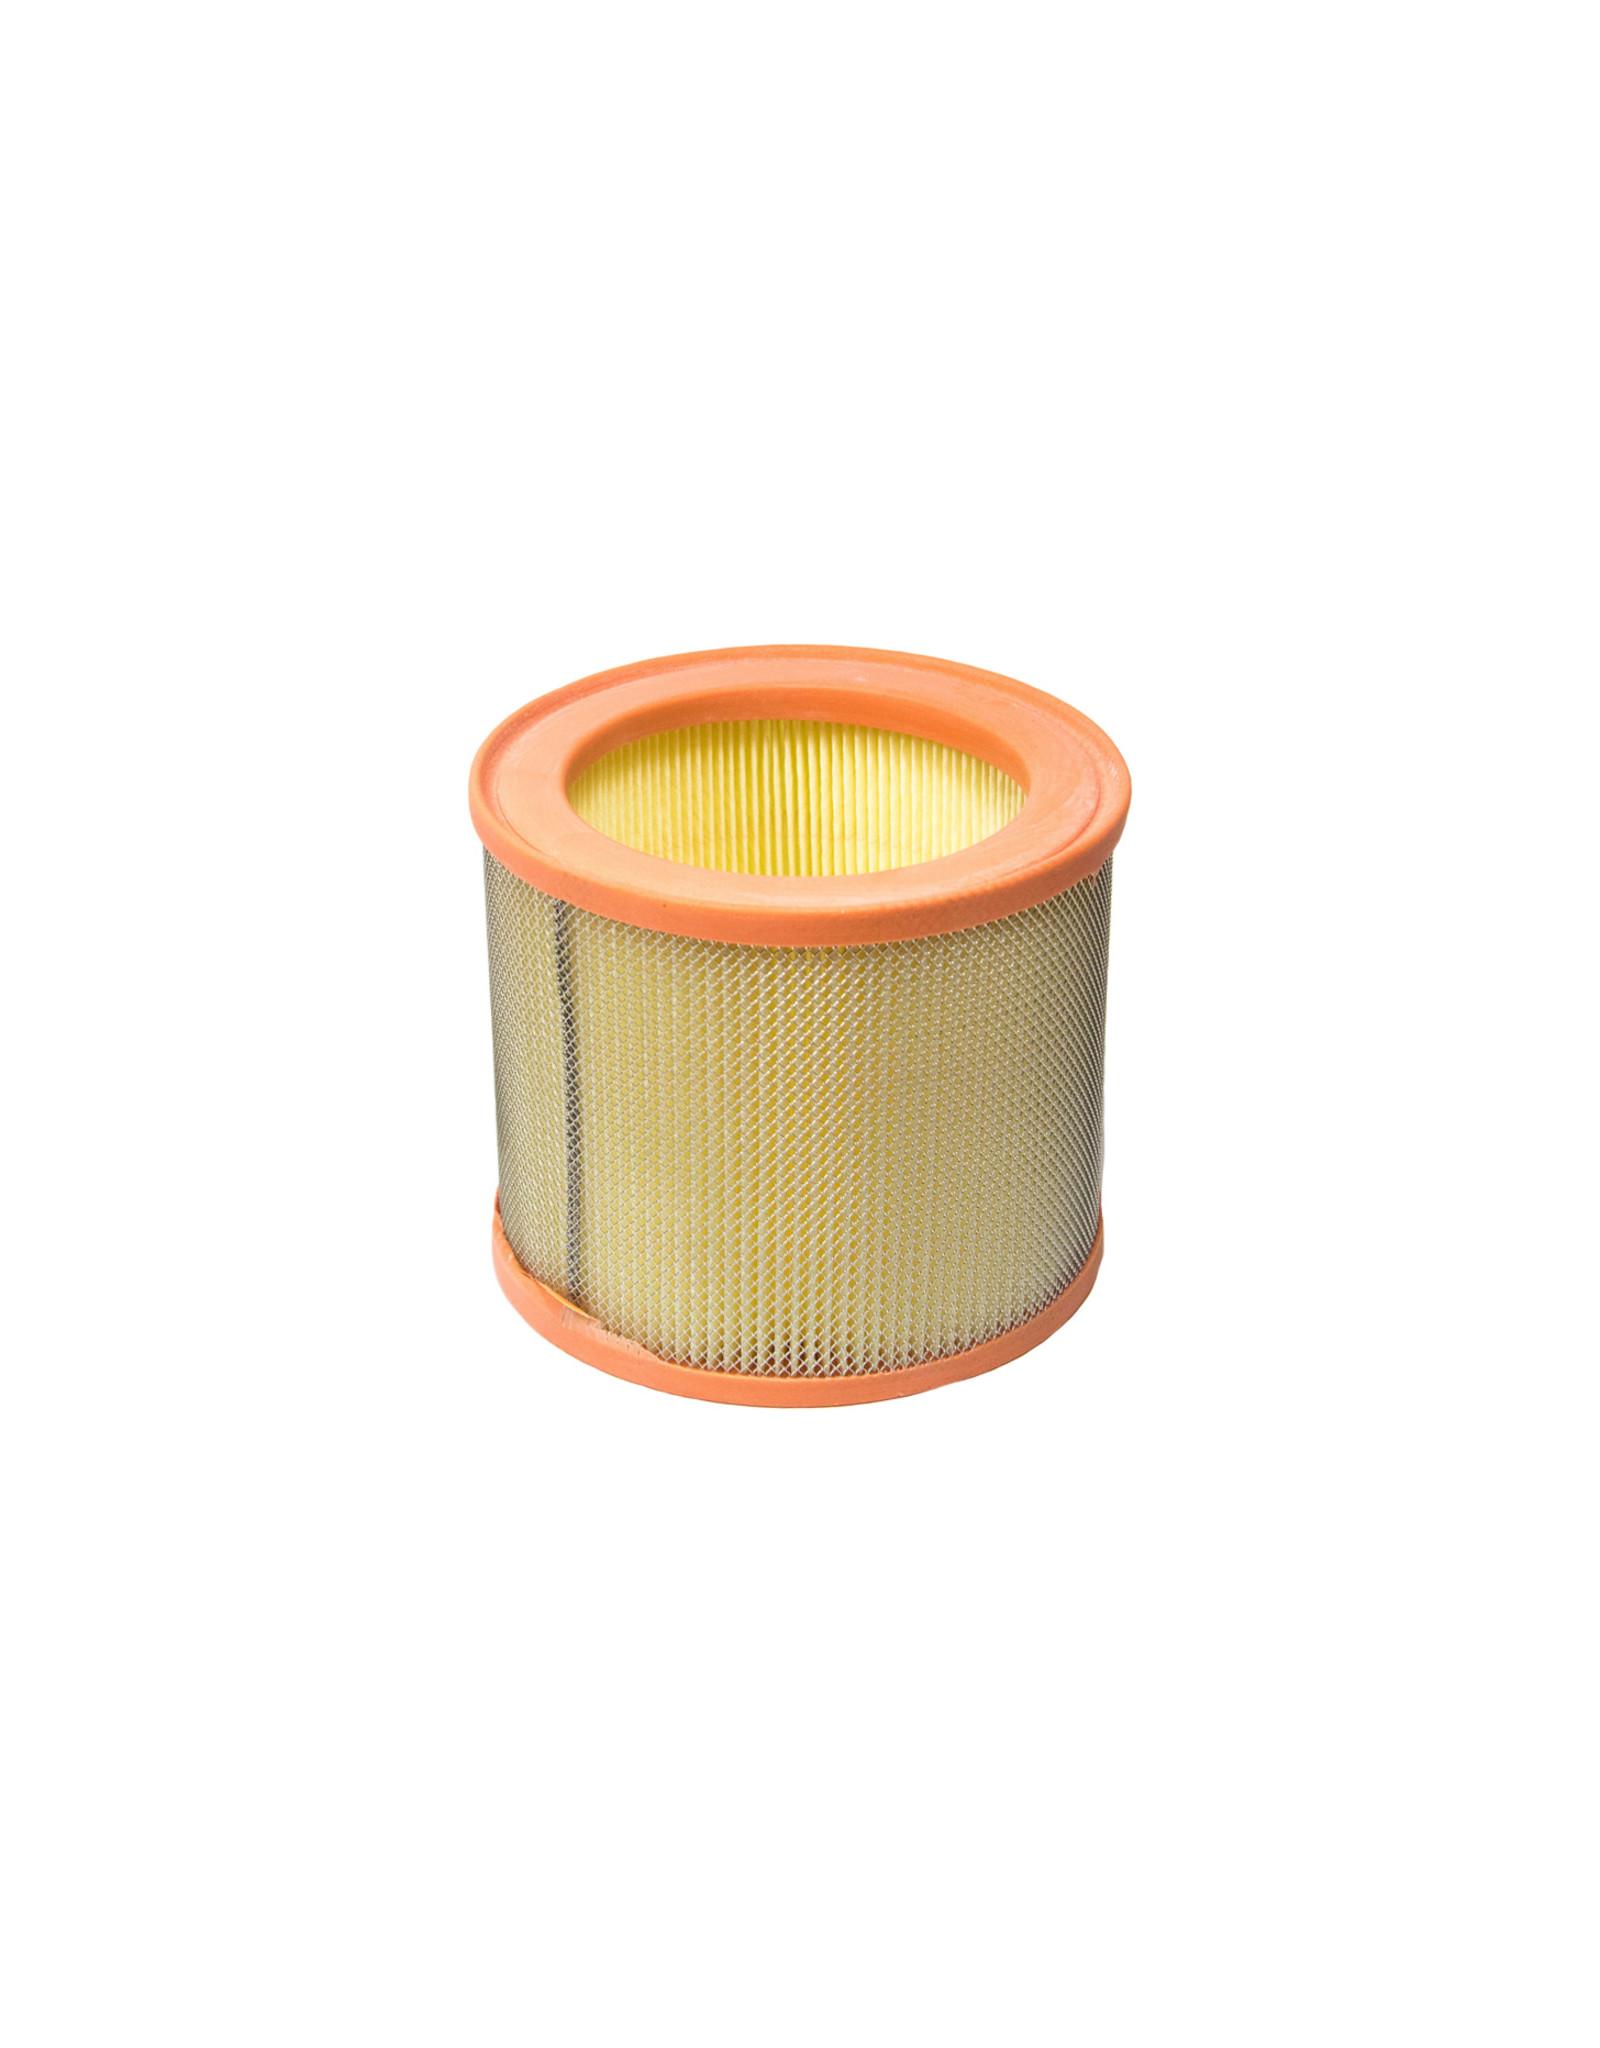 Aprilia Air Filter Genuine Gen 1 (98-00) Falco & Futura AP8102610